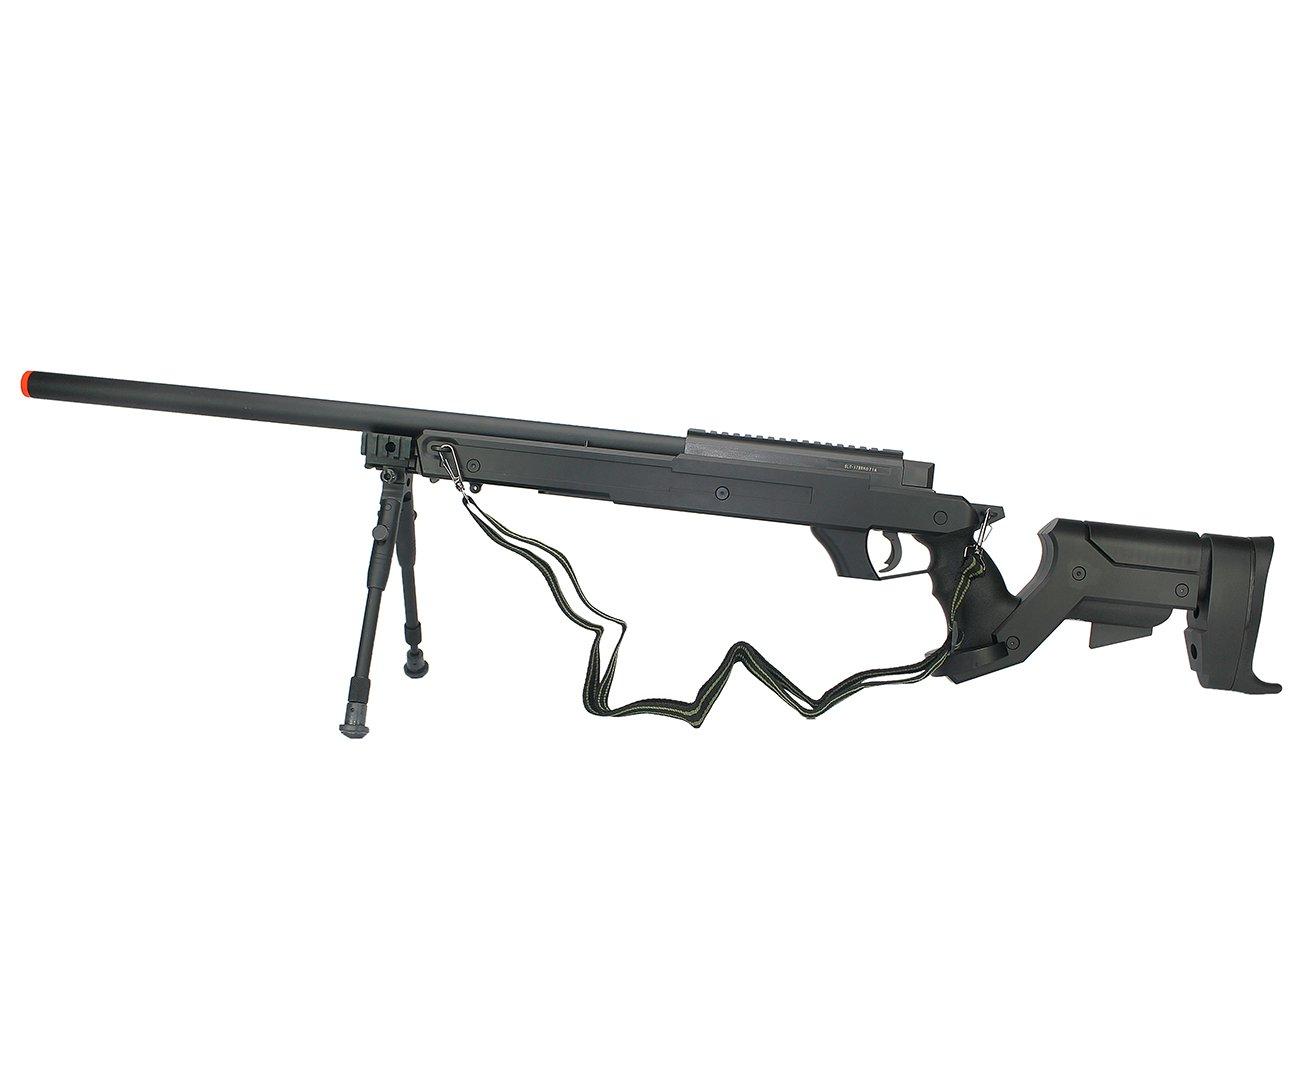 Rifle Sniper De Airsoft Gás Gbb G22b Com Bipé Cal 6.0mm Well